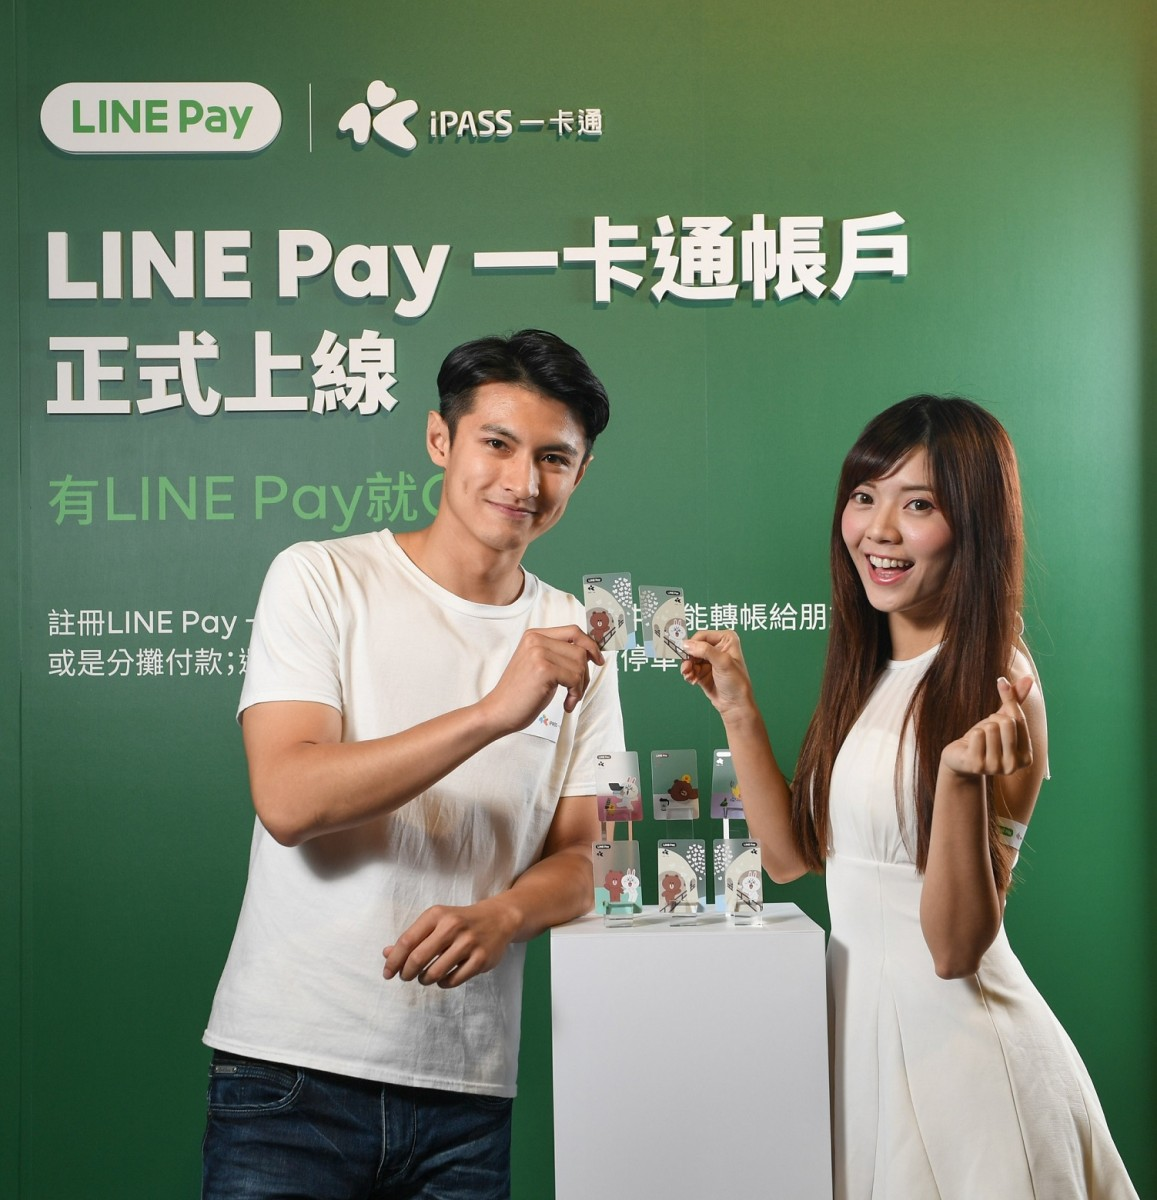 LINE Pay一卡通上線》限量30萬張一卡通好康活動連發!